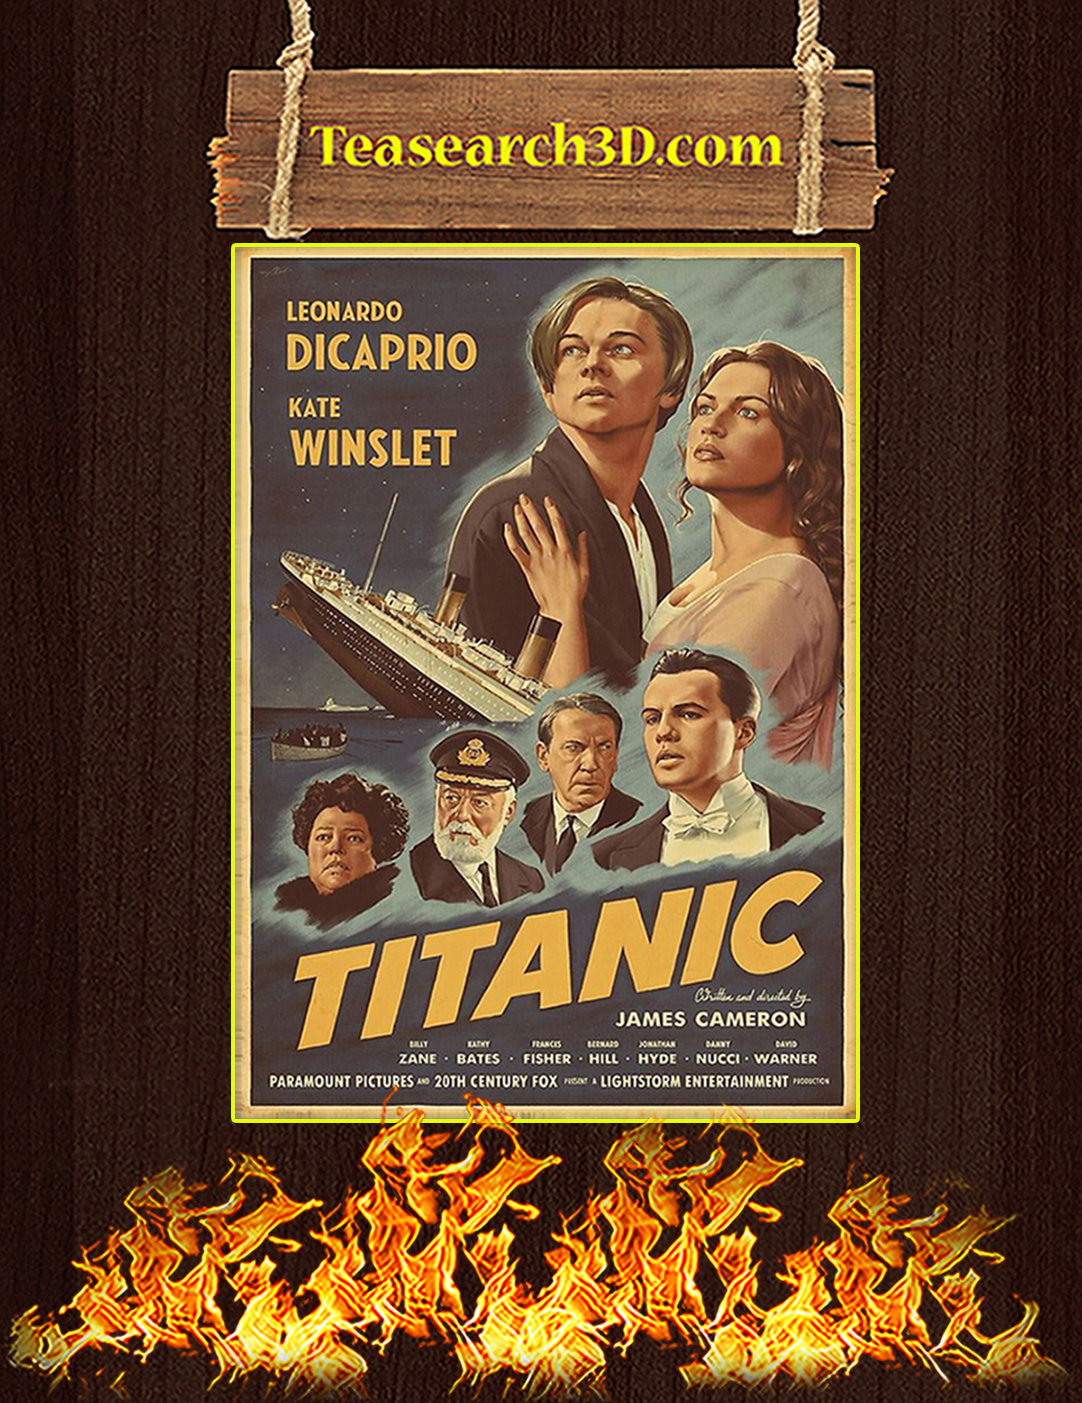 Titanic Leonardo Dicaprio Kate Winslet Poster A2